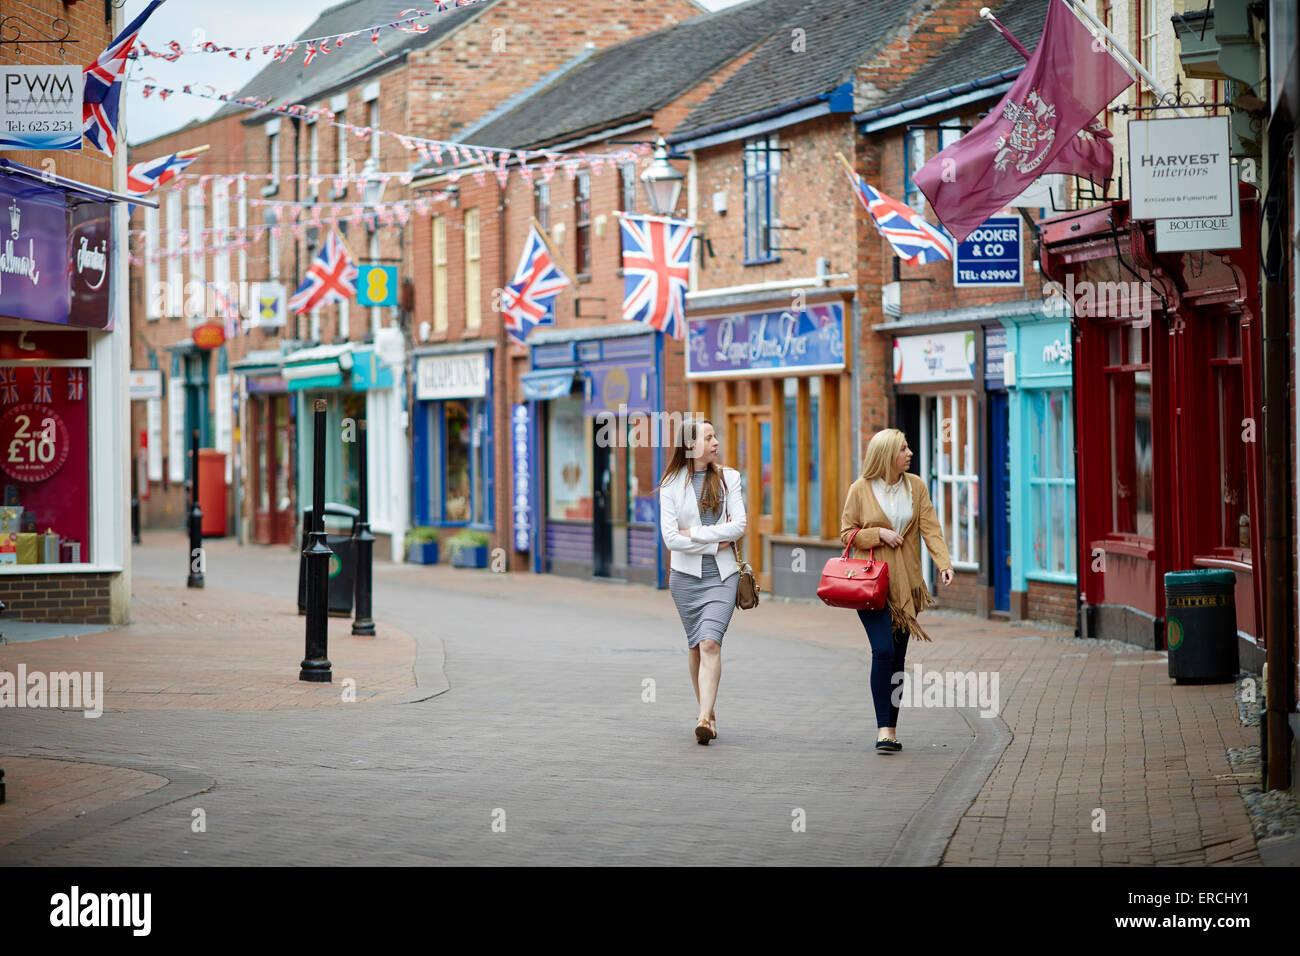 Nantwich shopping town centre shops street - Stock Image